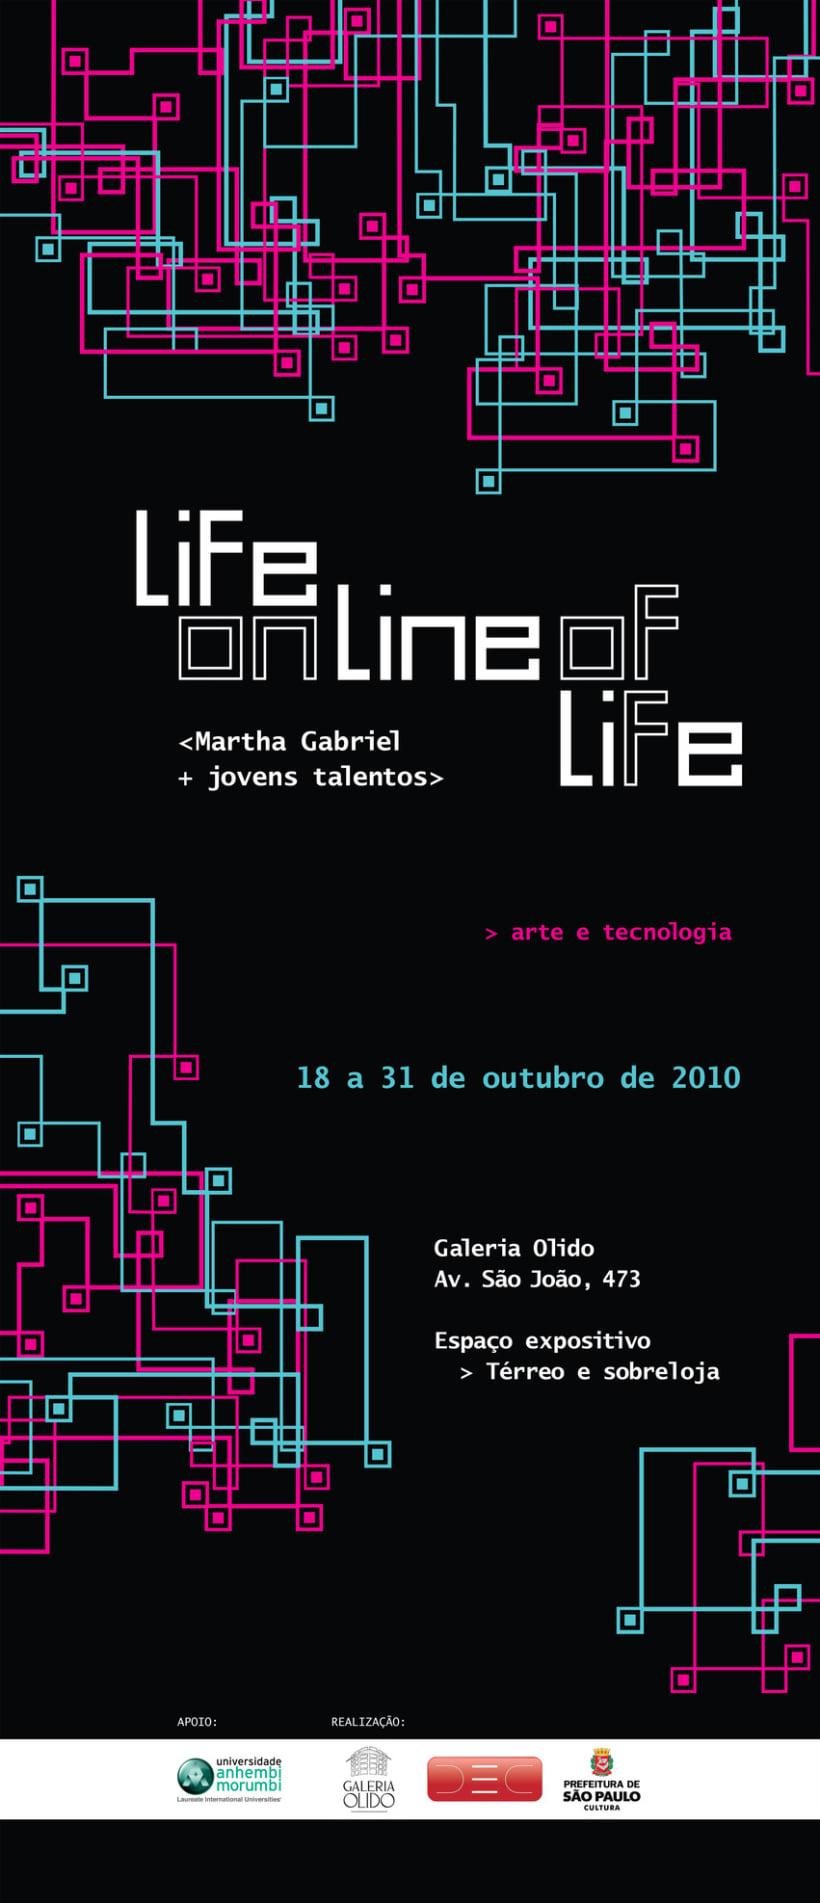 LIFE on LINE of LIFE 6